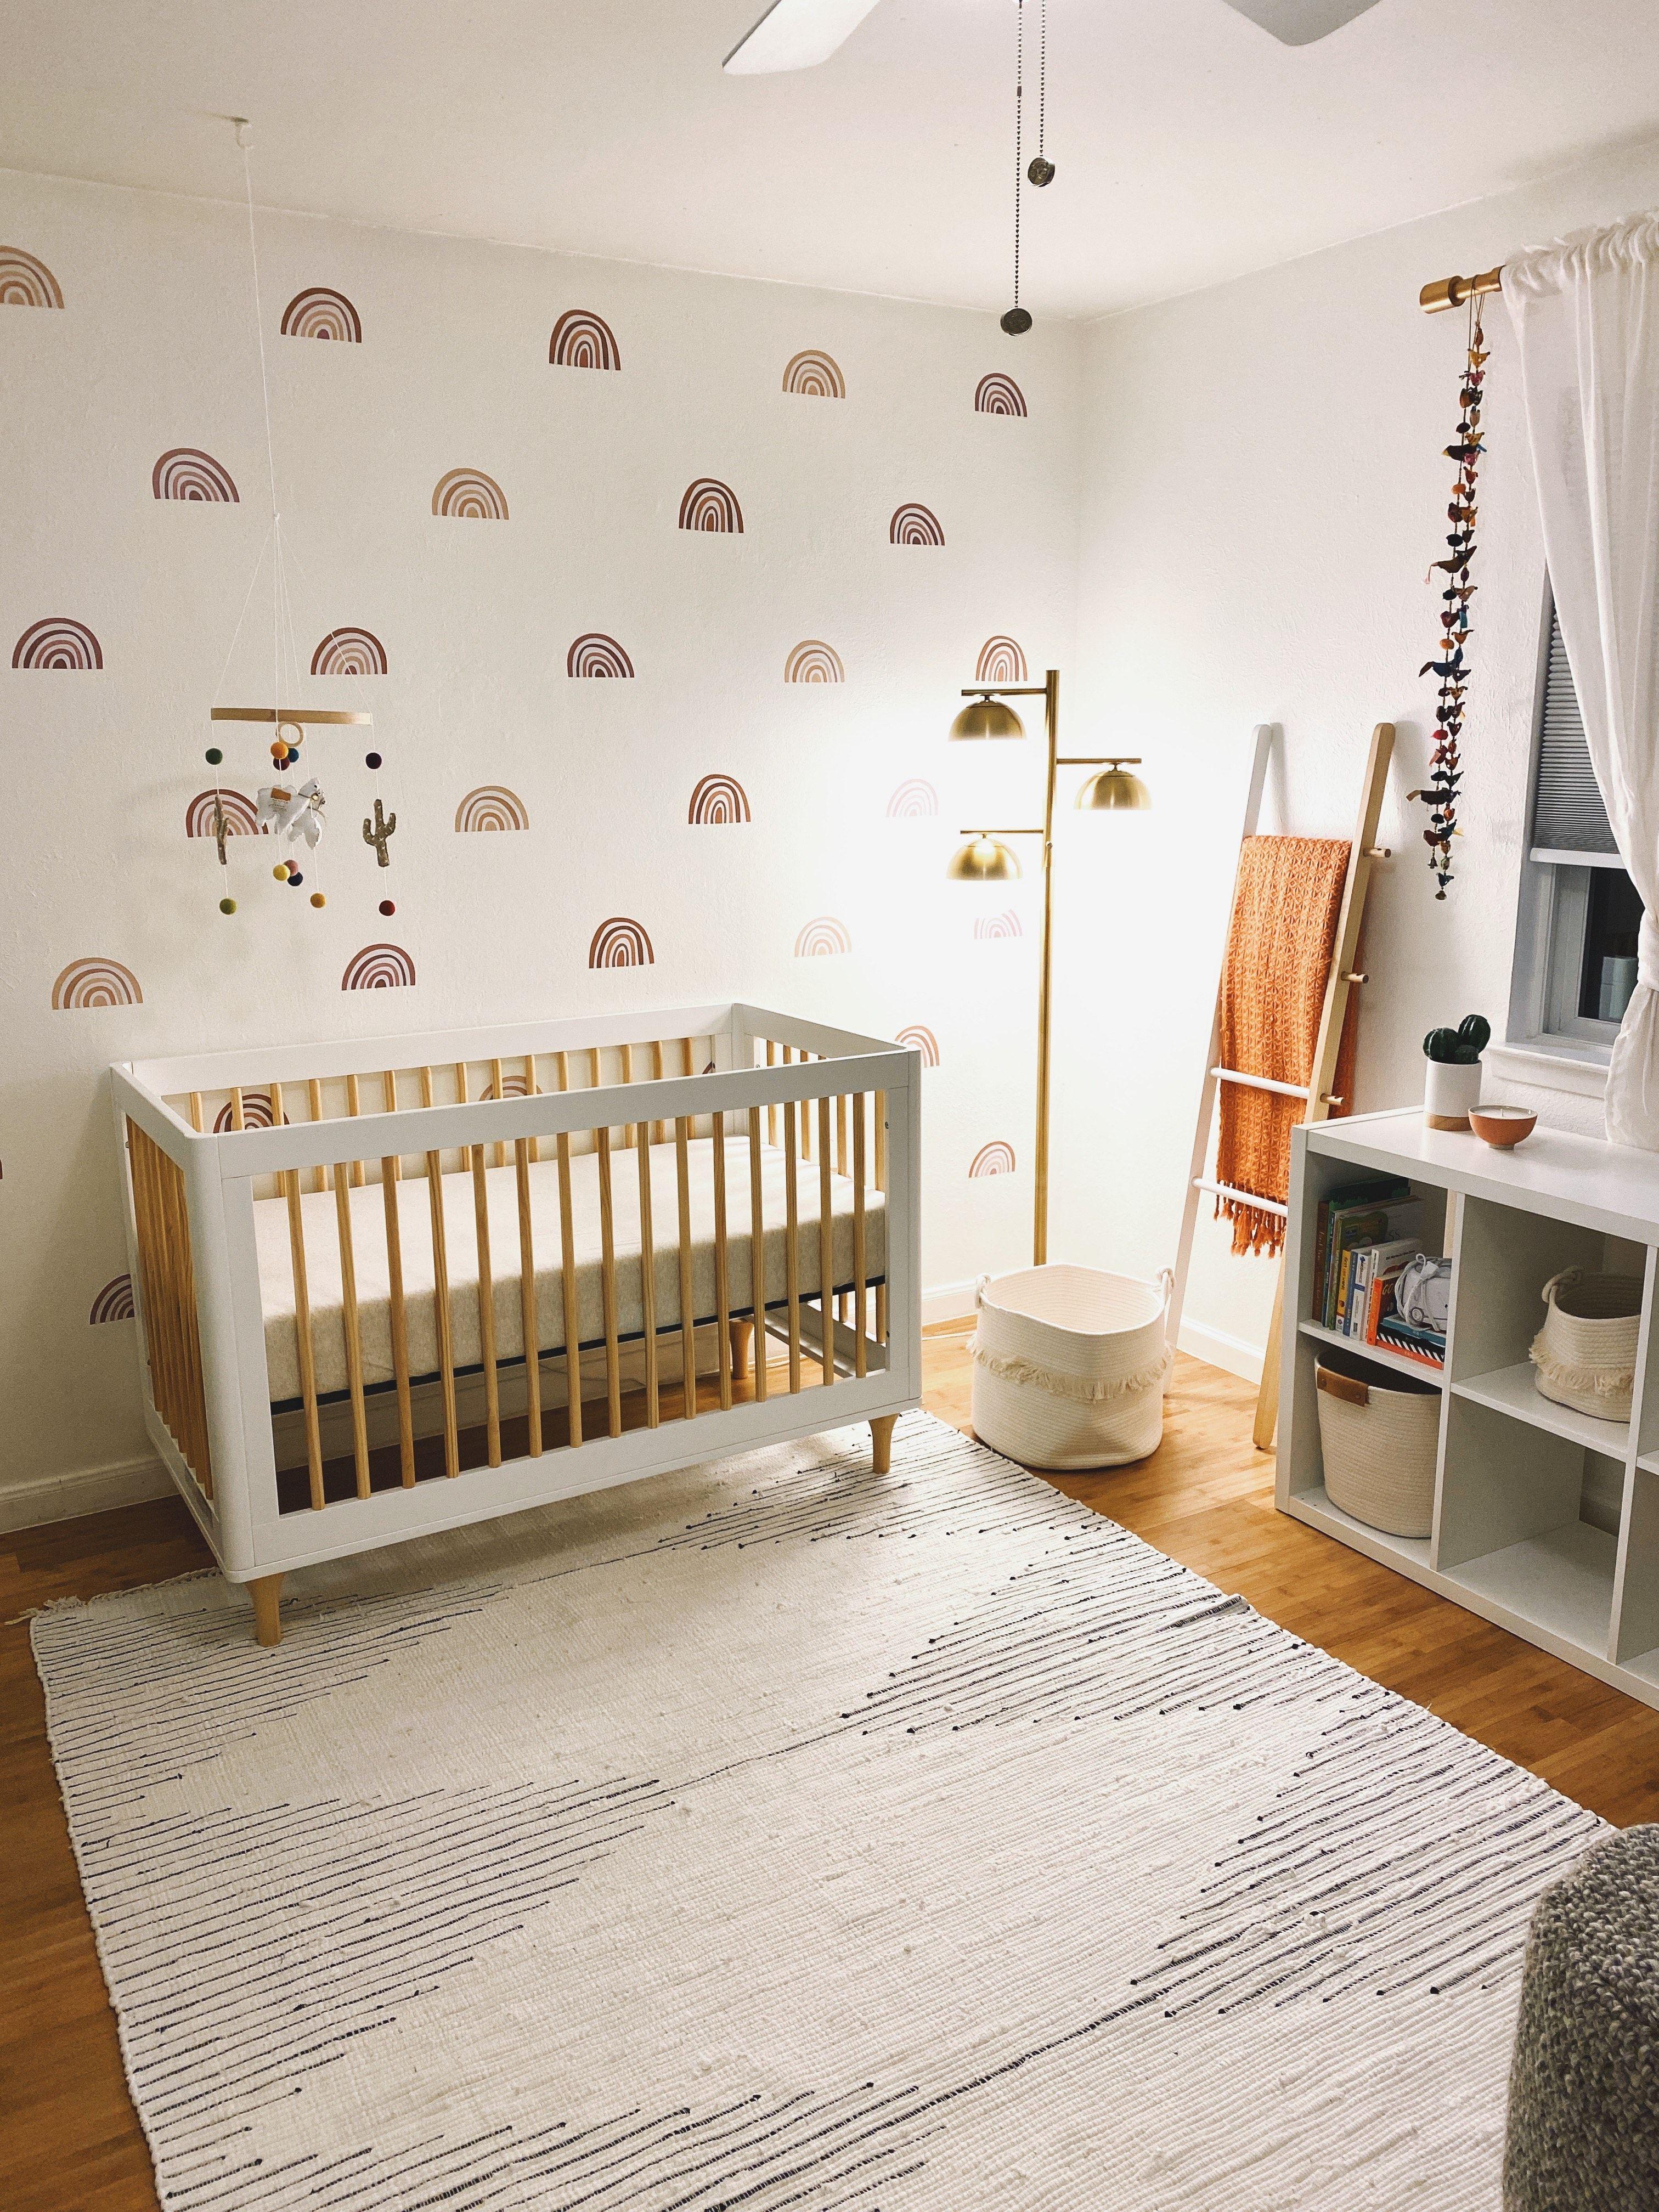 Mini Ombre Rainbows Nursery Baby Room Baby Room Neutral Minimalist Baby Room